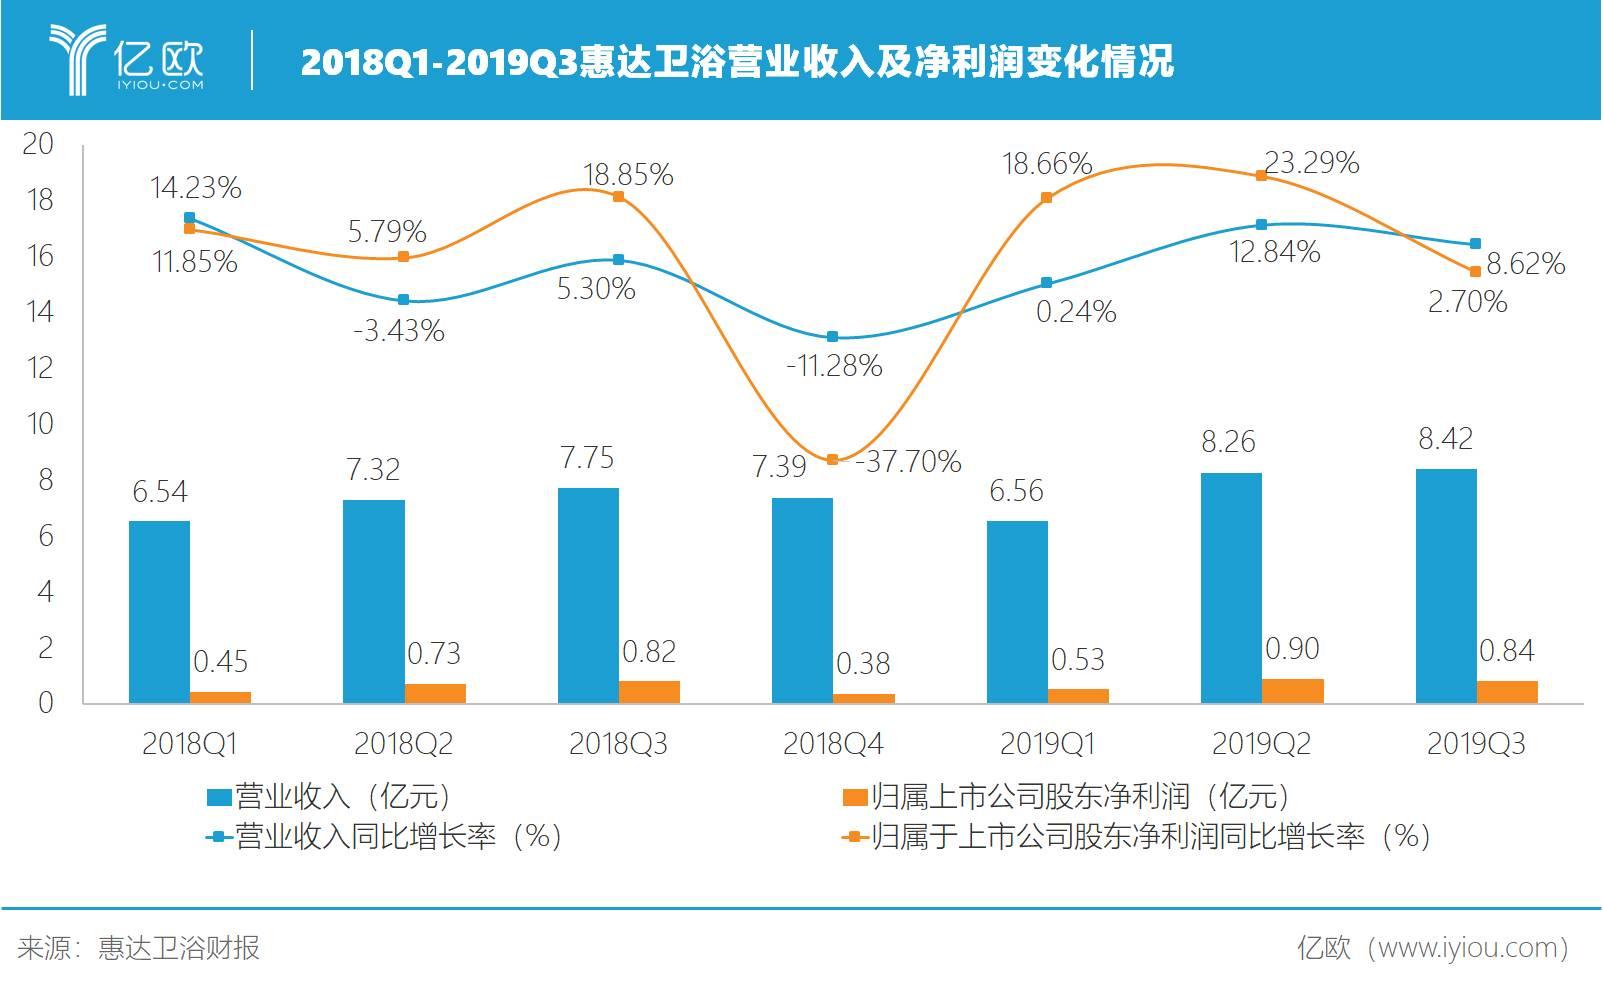 2018Q1-2019Q3惠达卫浴营业收入及净利润变化情况